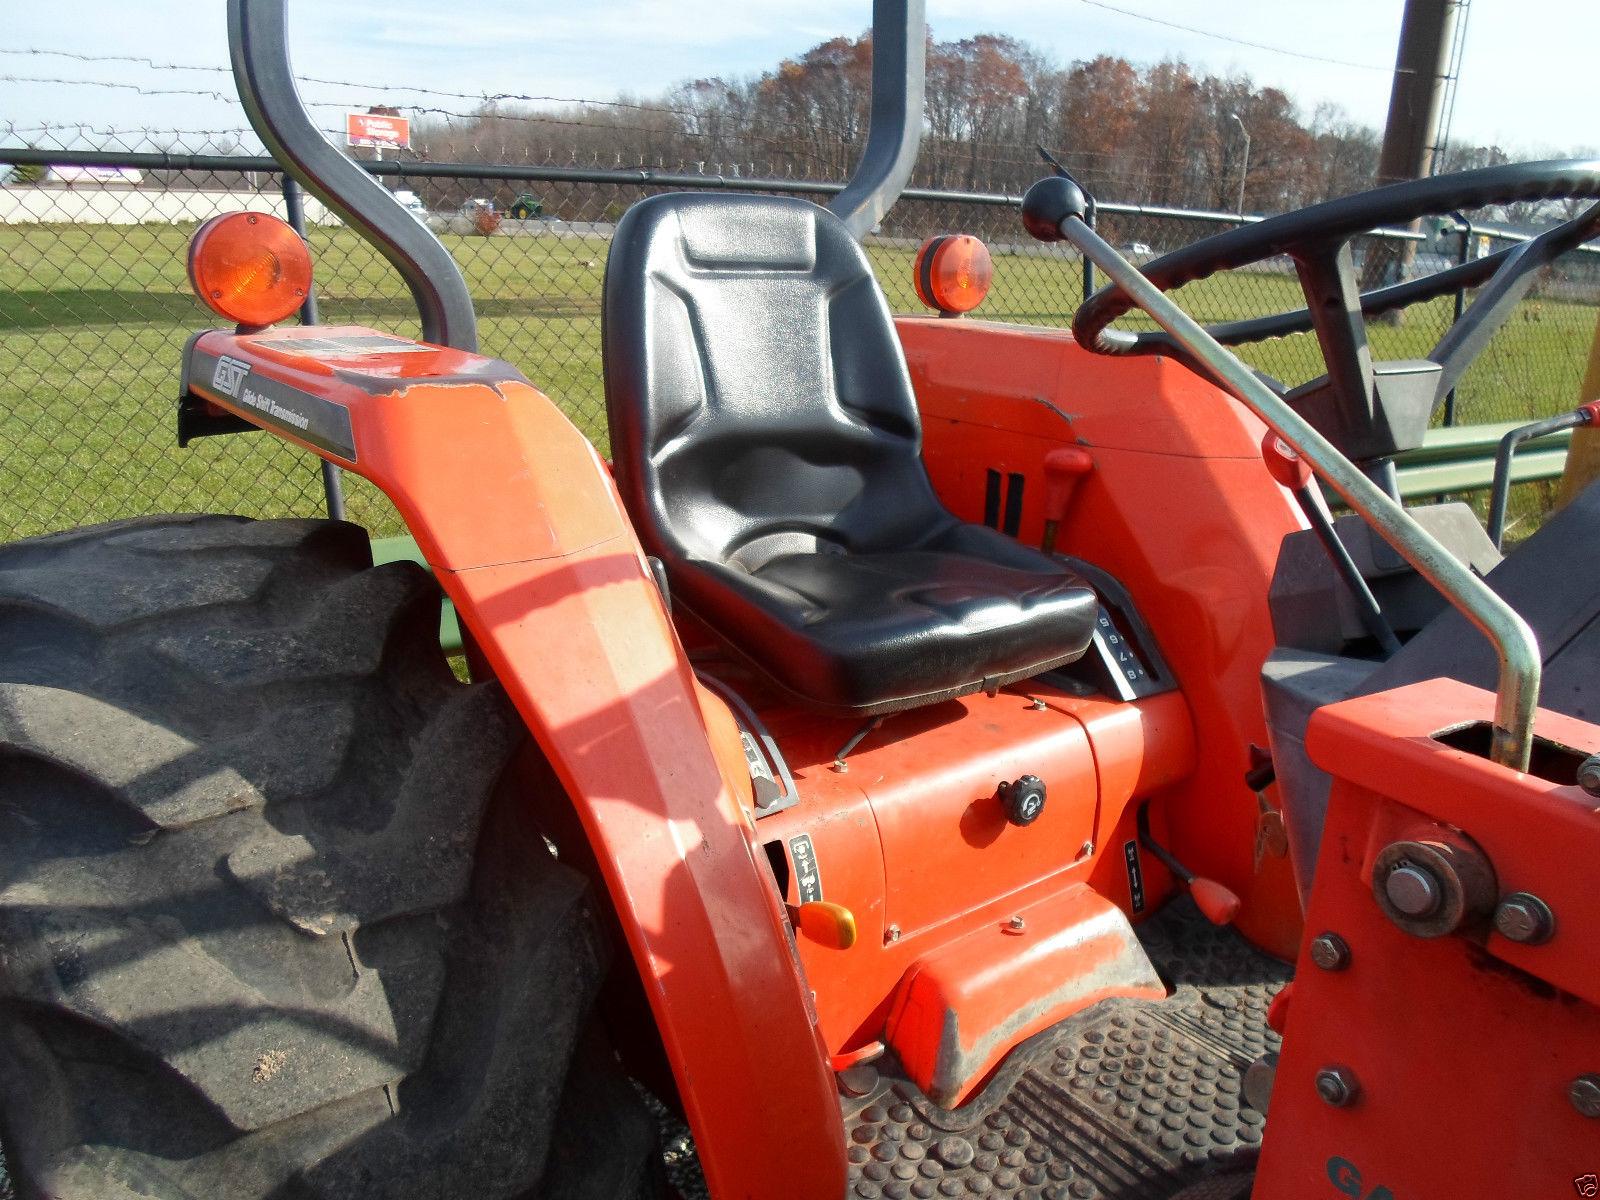 high back black seat for kubota b series and l series compact Kubota Snowblower kubota b2710 engine diagram Kubota B1700 Kubota L3830gst Kubota L3540 Engine Diagram